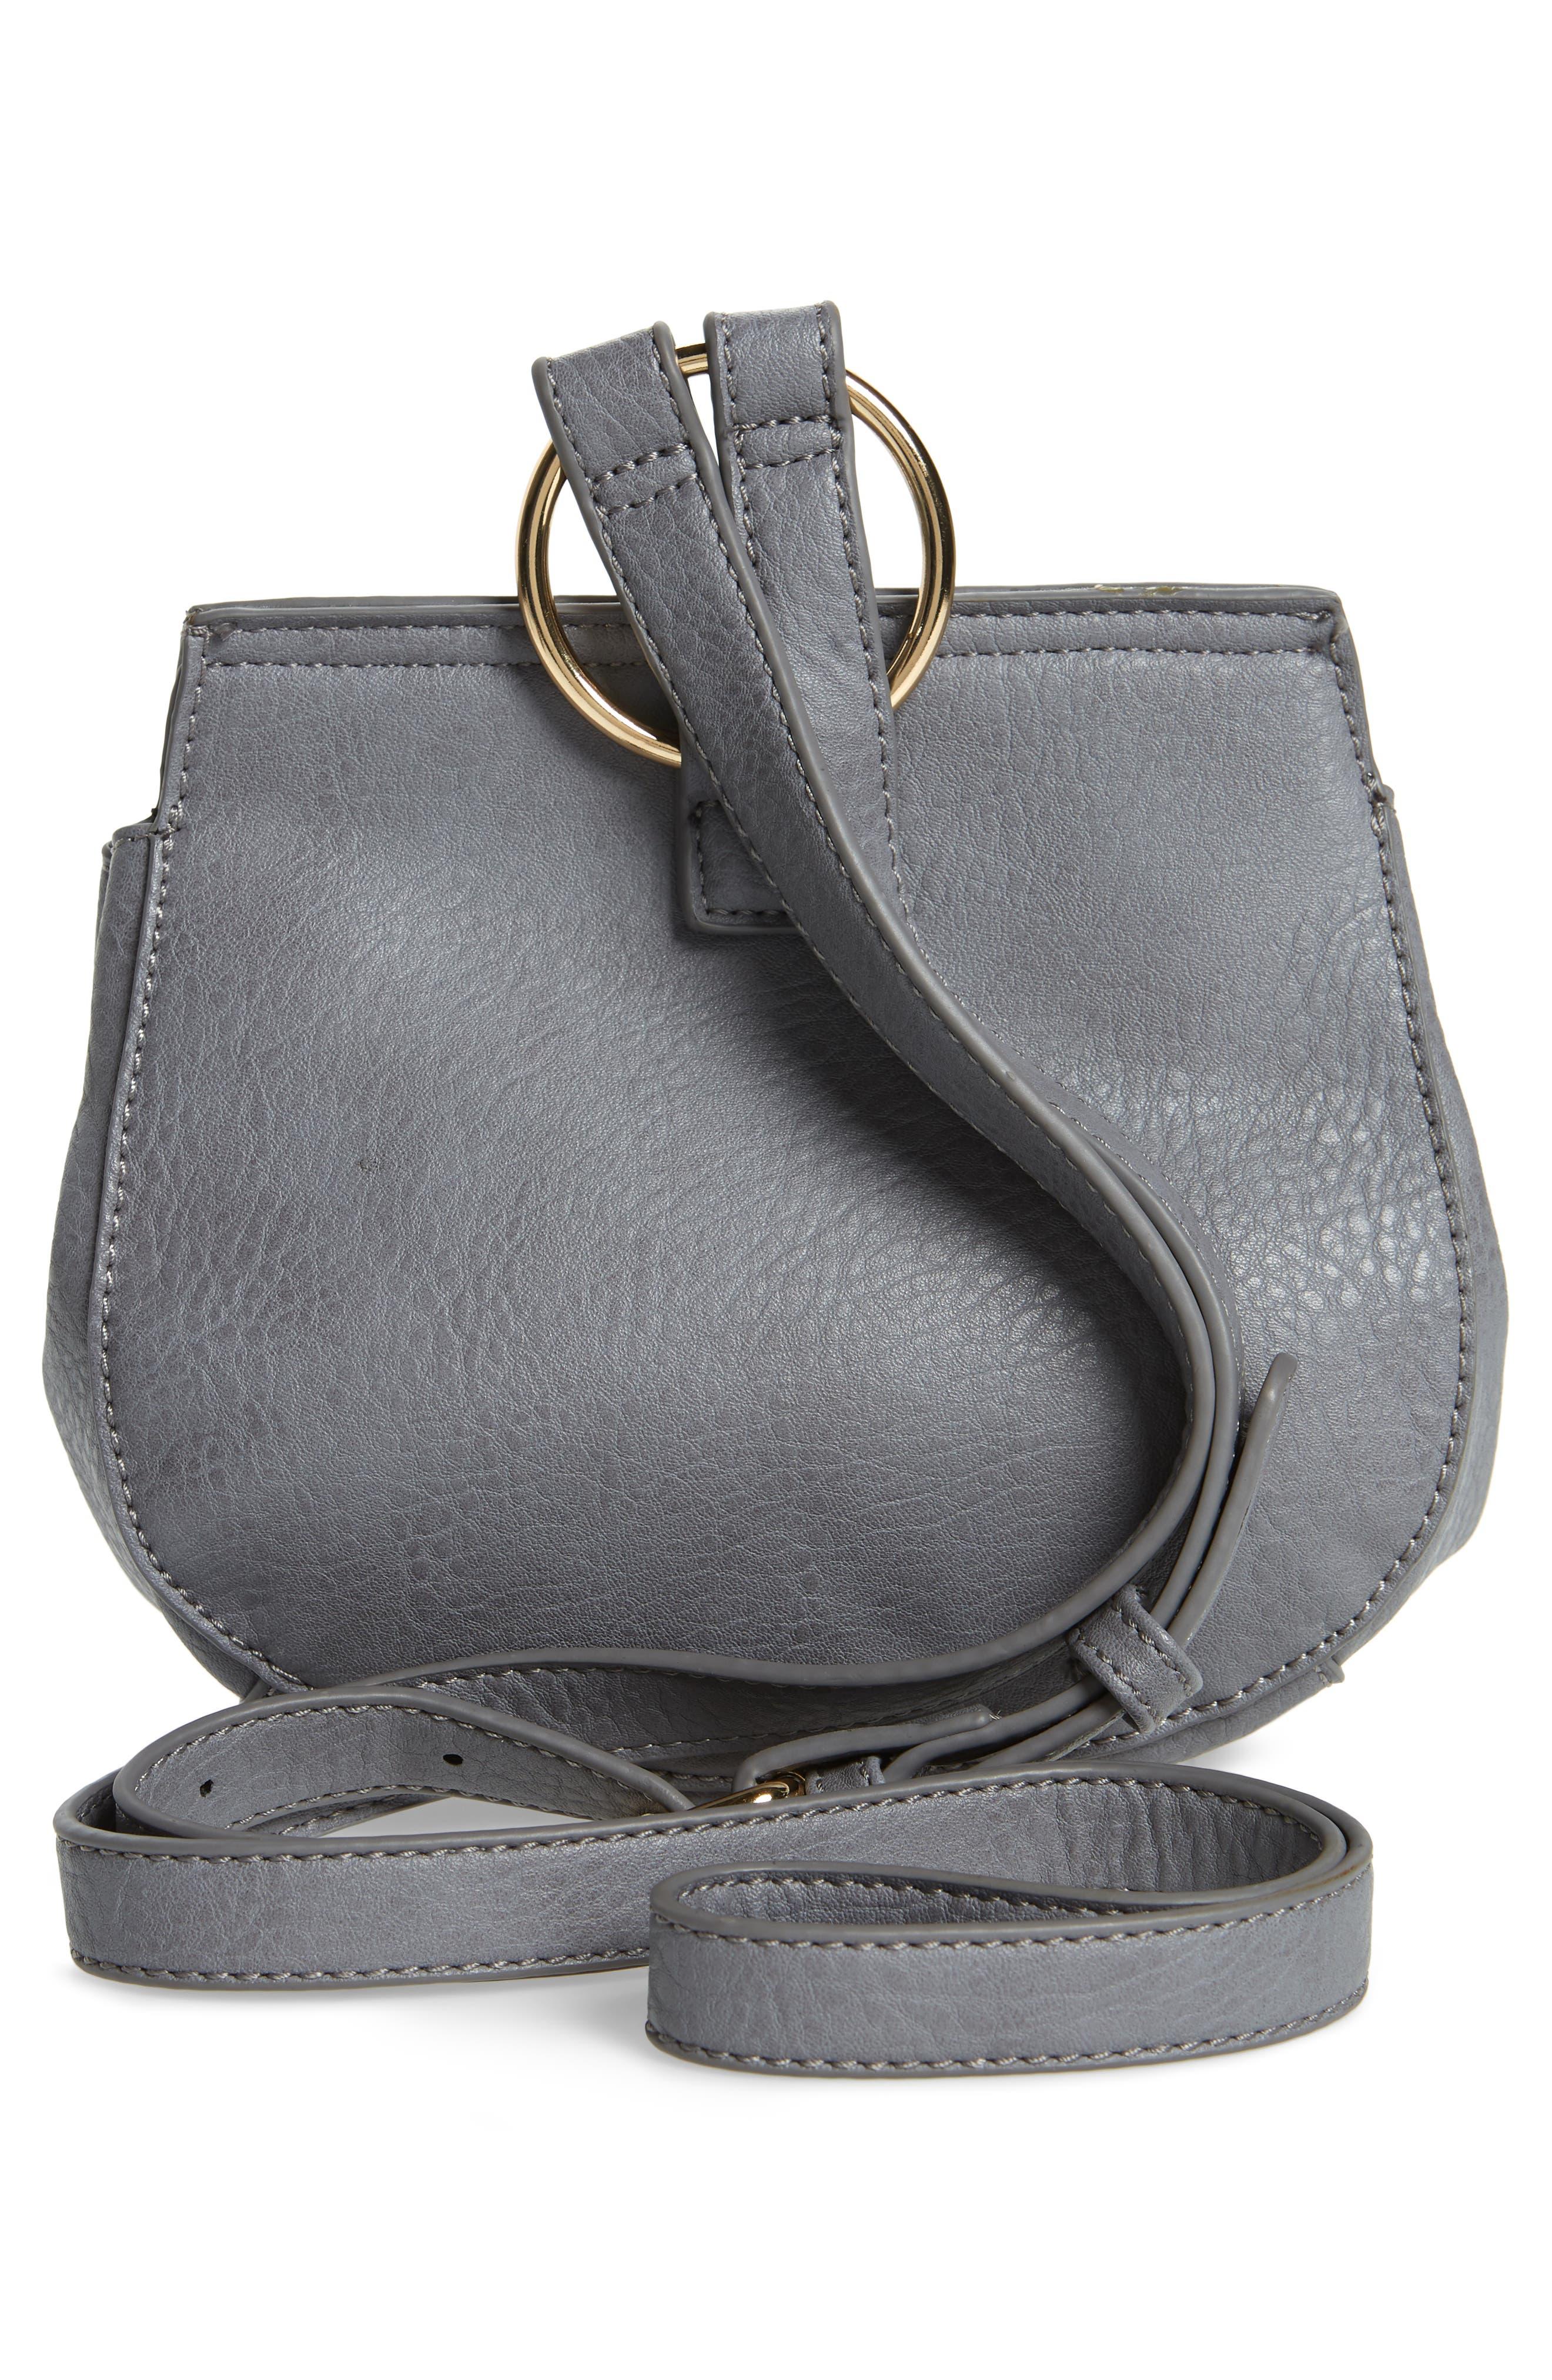 Tassel Faux Leather Crossbody Saddle Bag,                             Alternate thumbnail 3, color,                             Grey